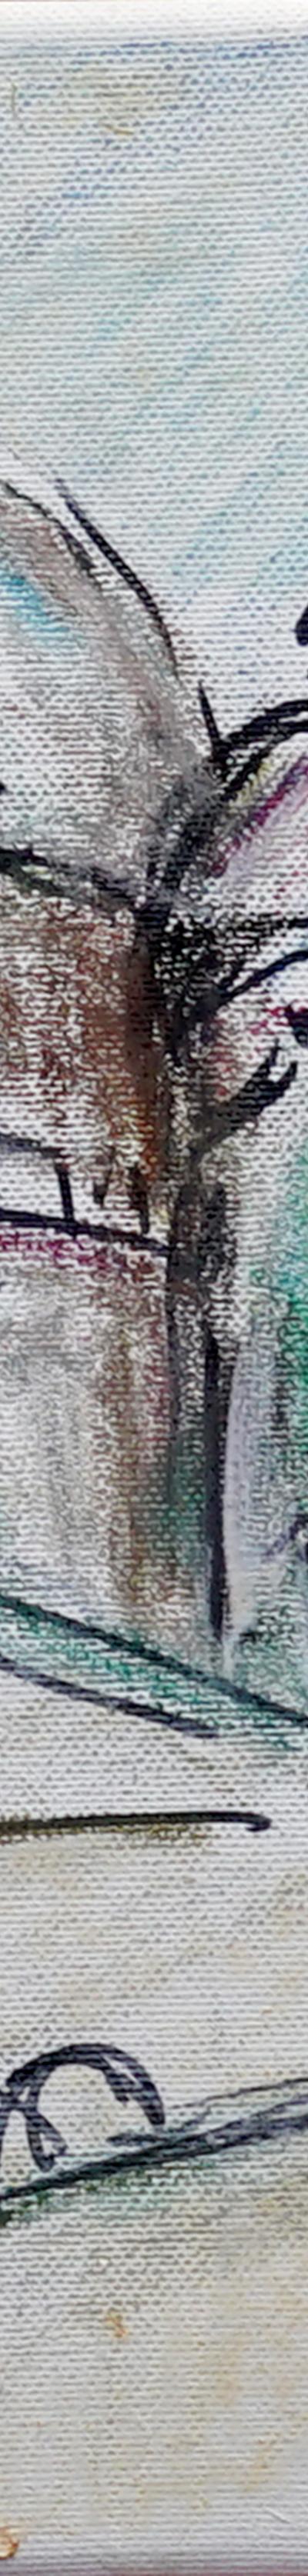 24x30 cm, oil on canvas